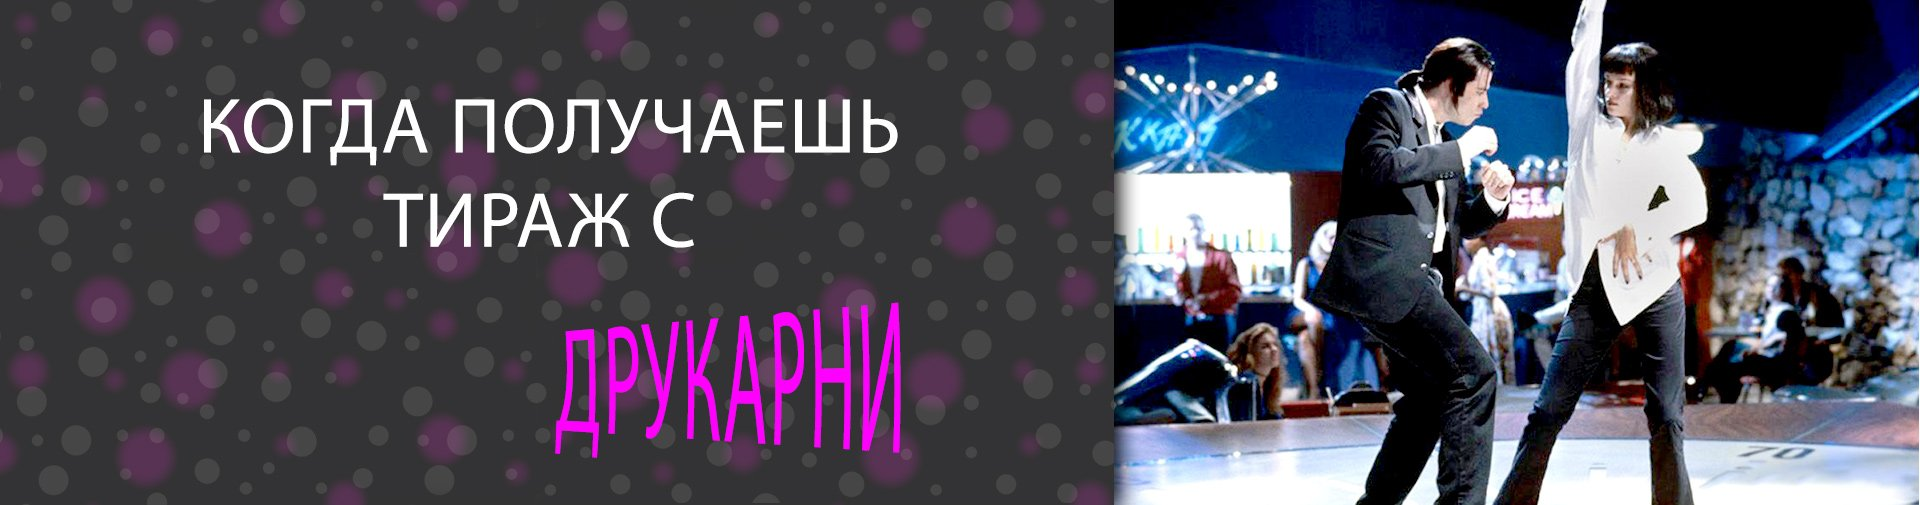 banner drukarnya_1